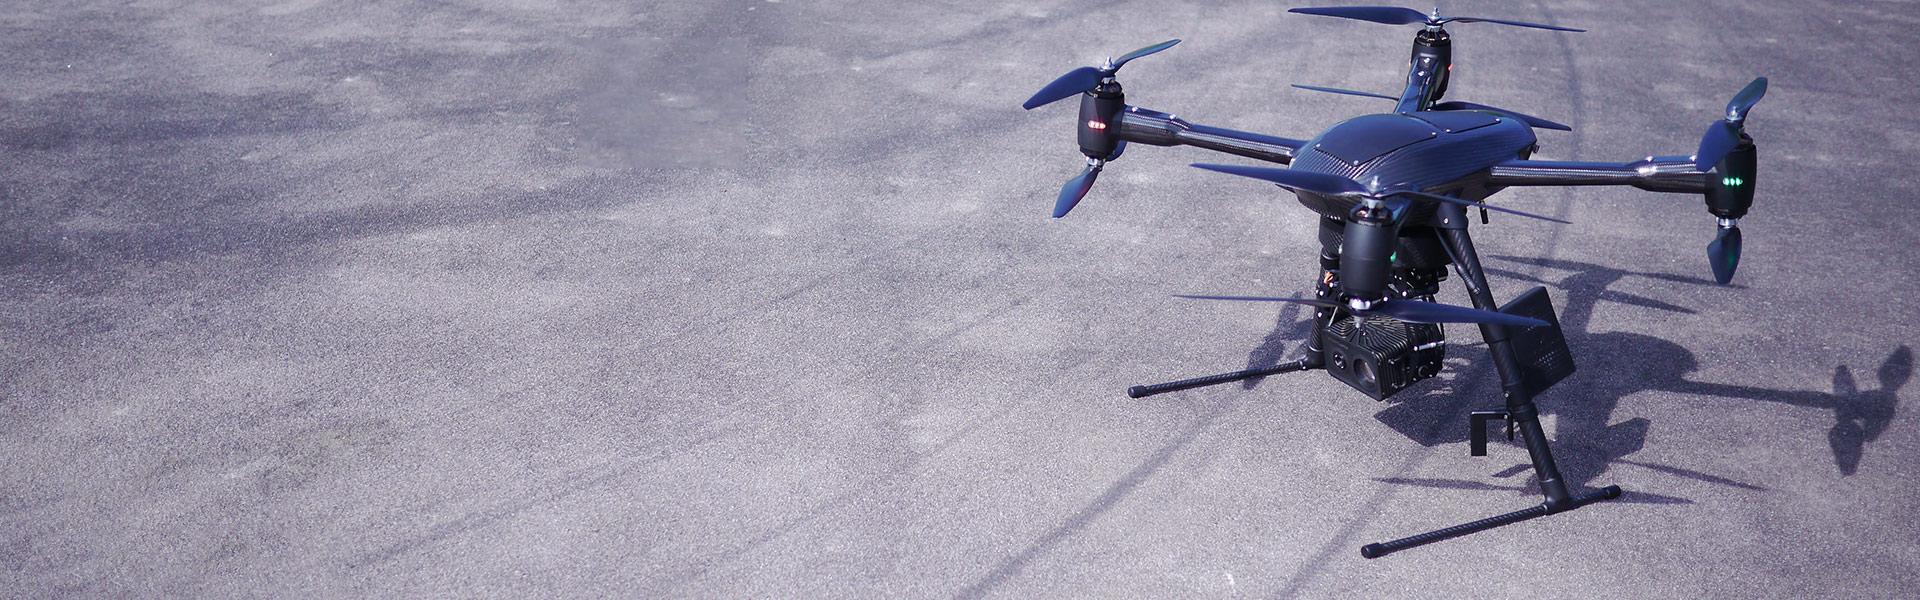 Acheter drone reconditionné drone x pro review philippines